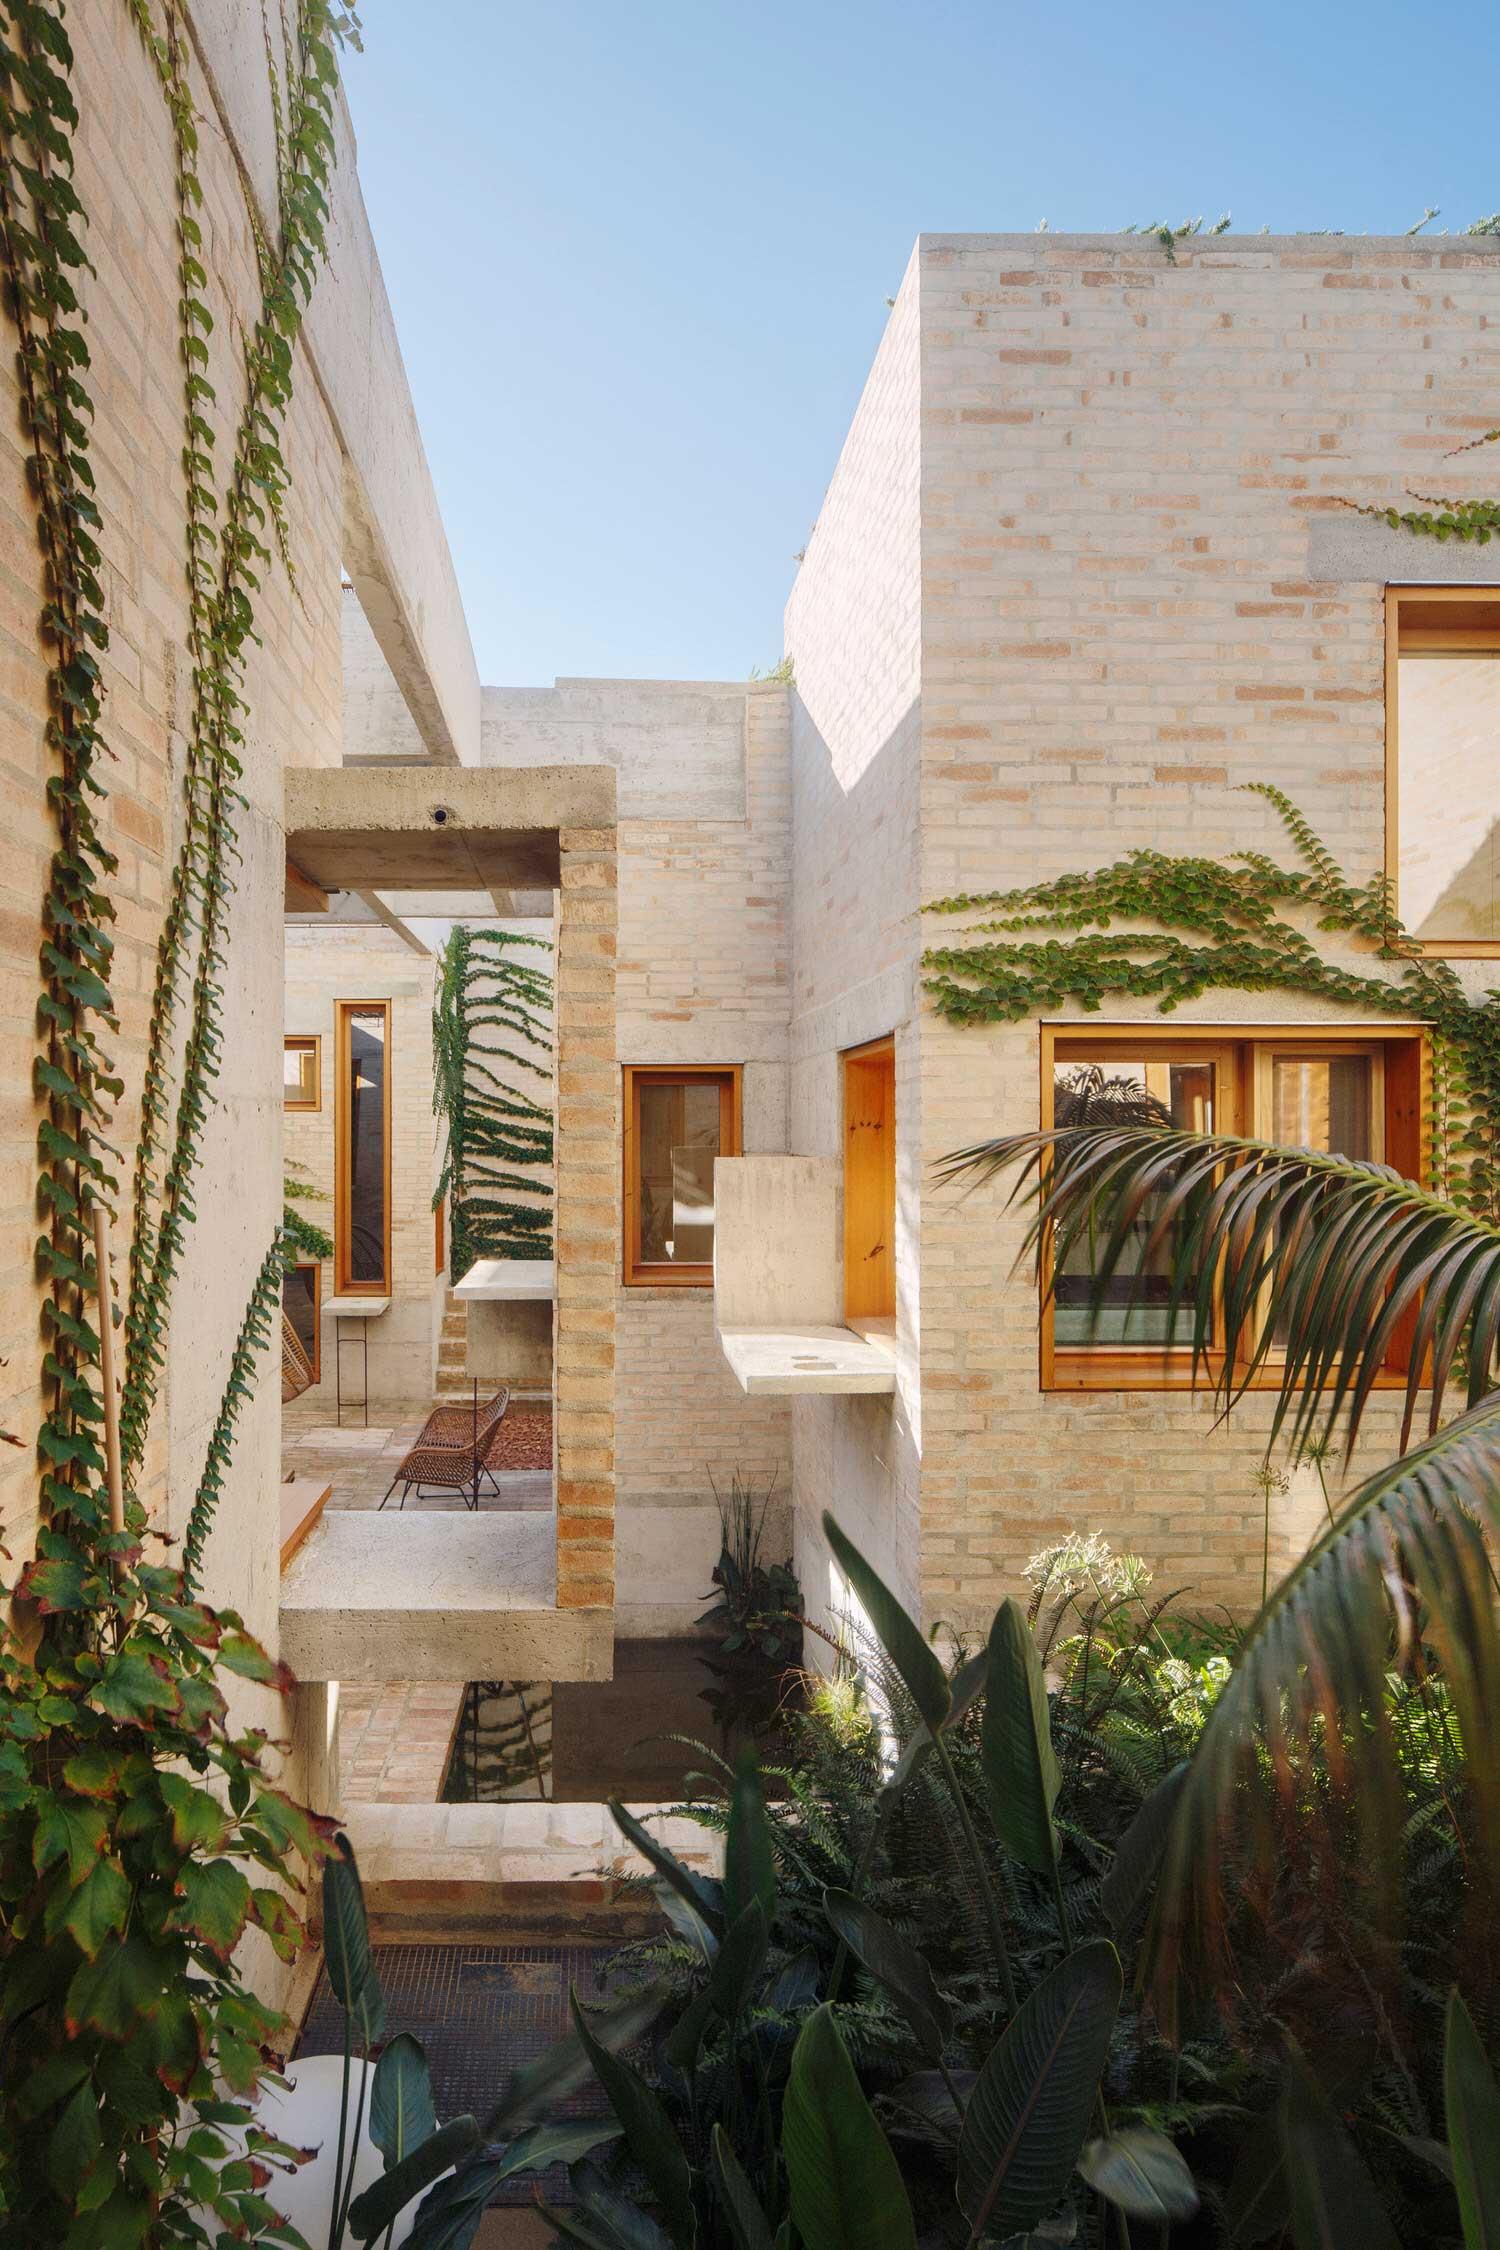 Ted'A Arquitectes, Can Jaime i n' Isabelle, Palma de Mallorca Architecture, Photo Luis Diaz Diaz   Yellowtrace